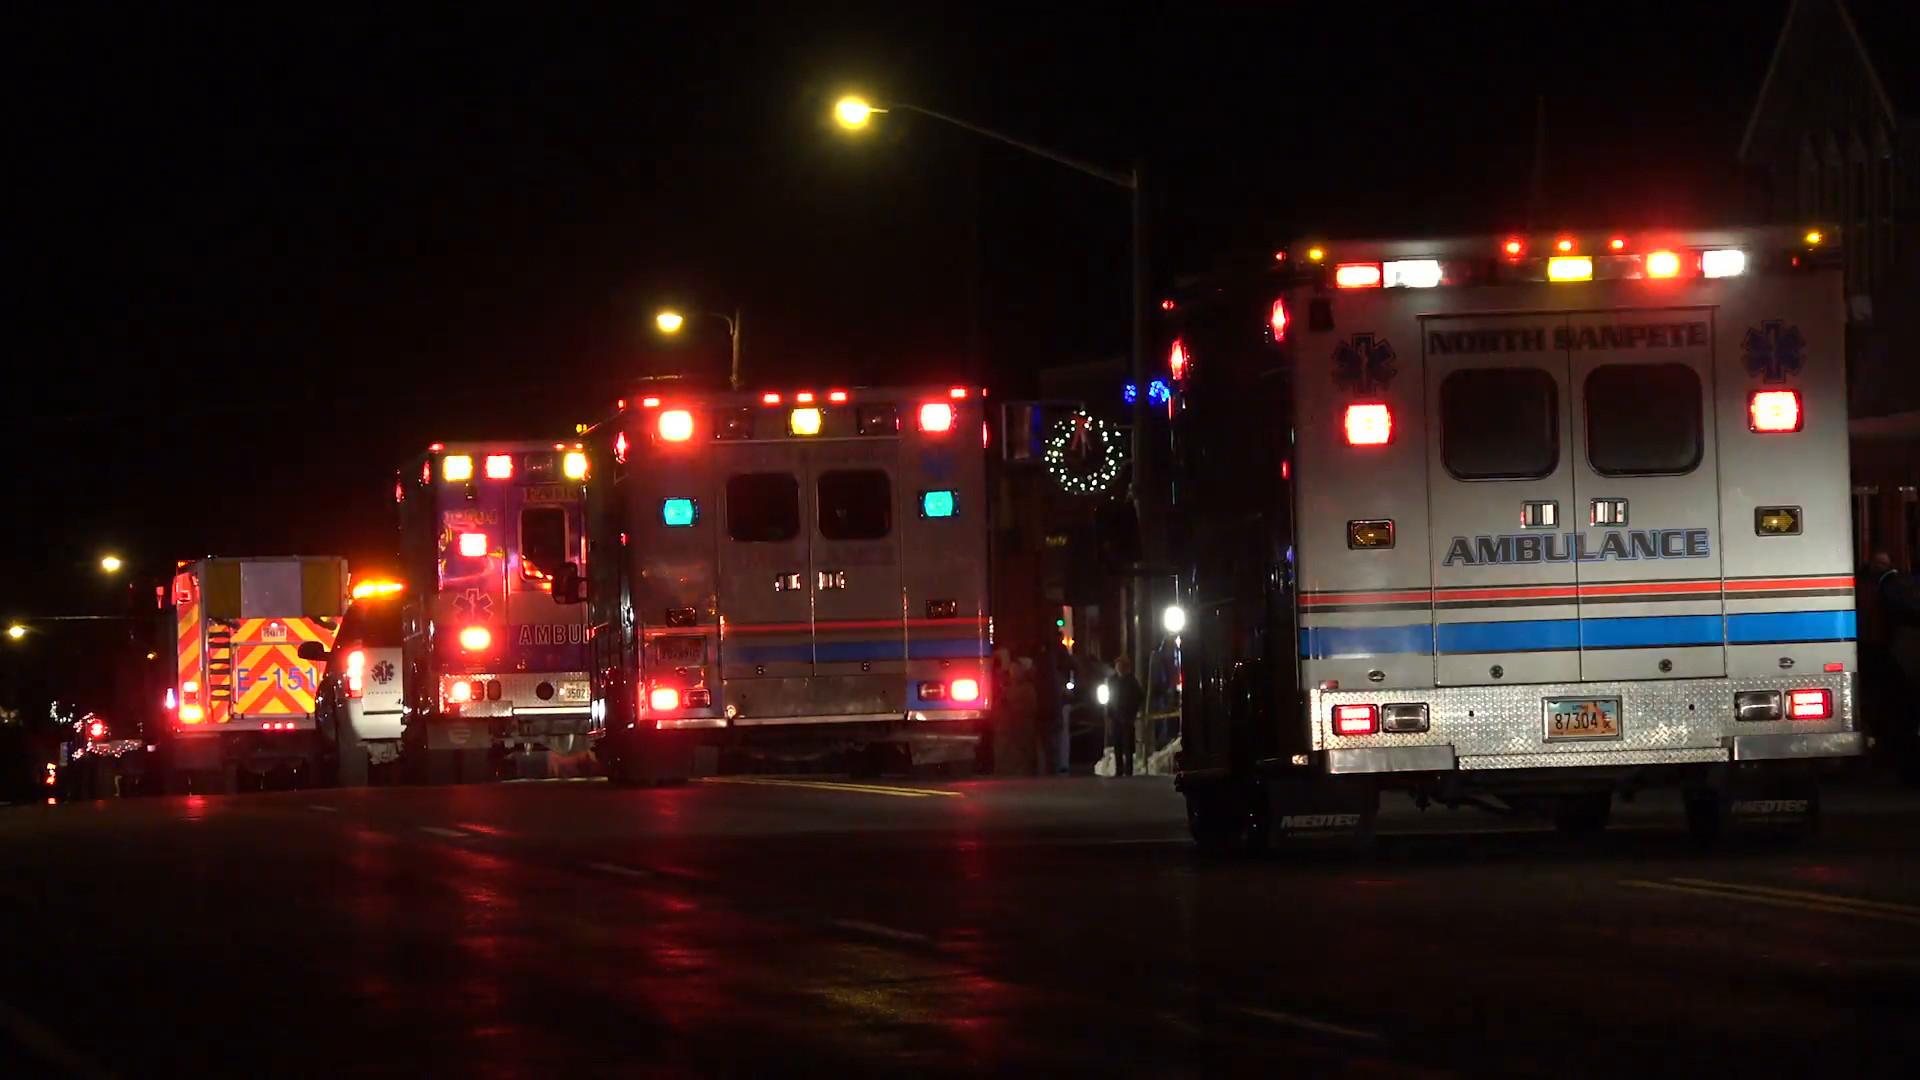 Ambulance Wallpaper 63 Images